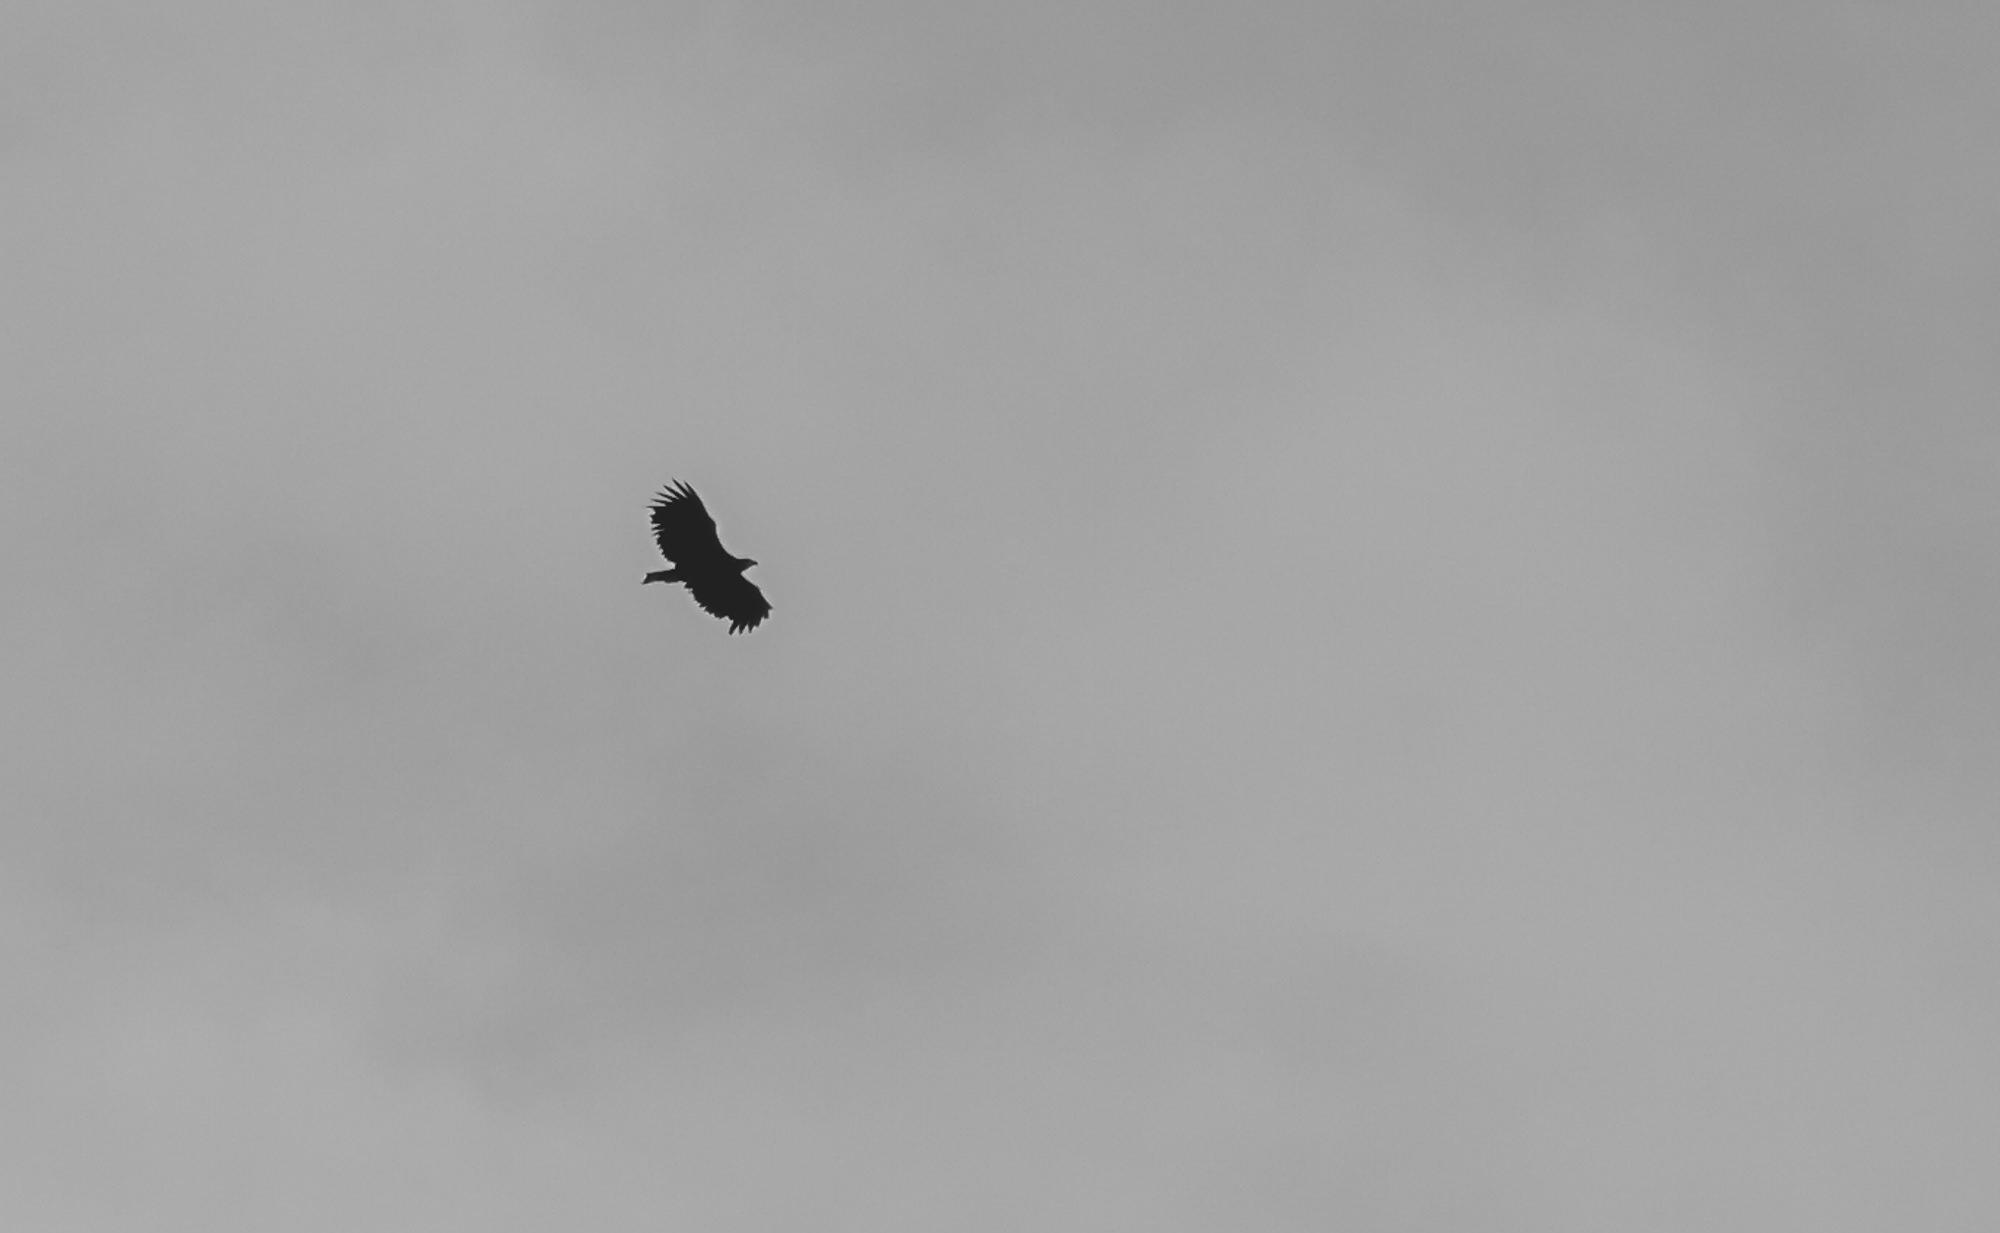 sea eagle lototen